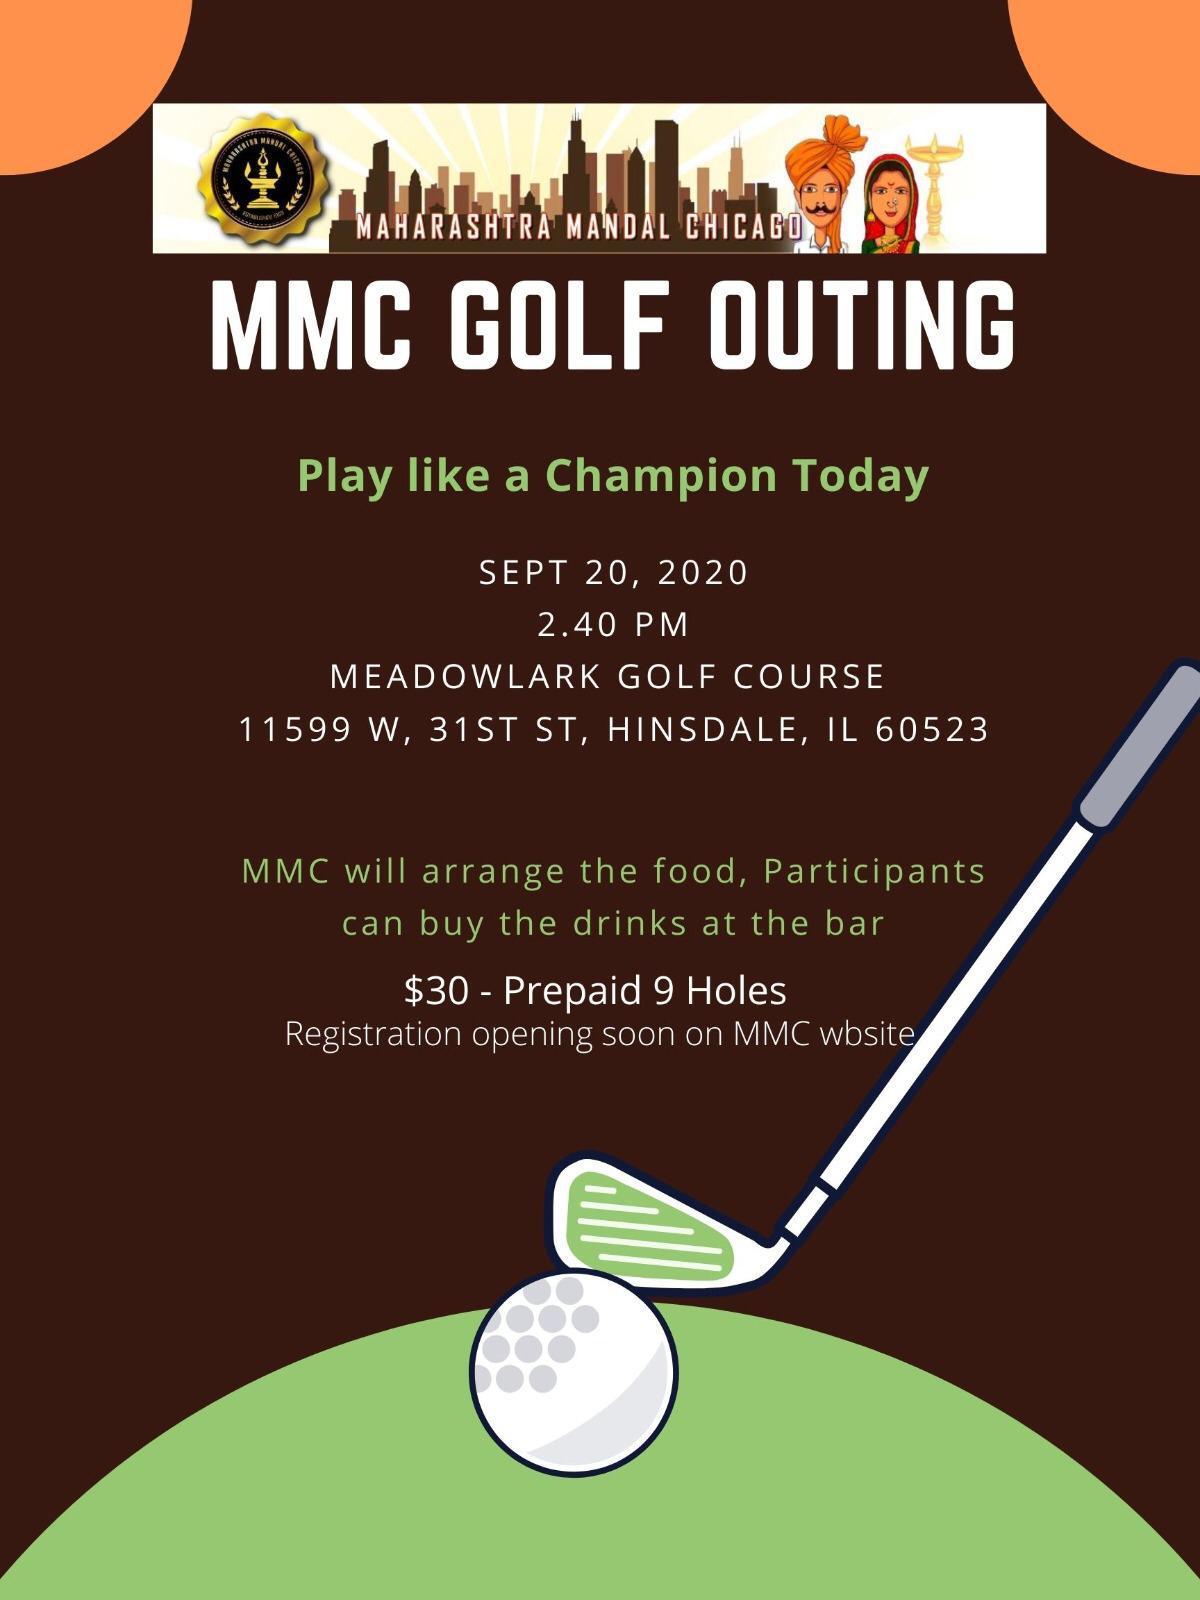 MMC Golf Outing